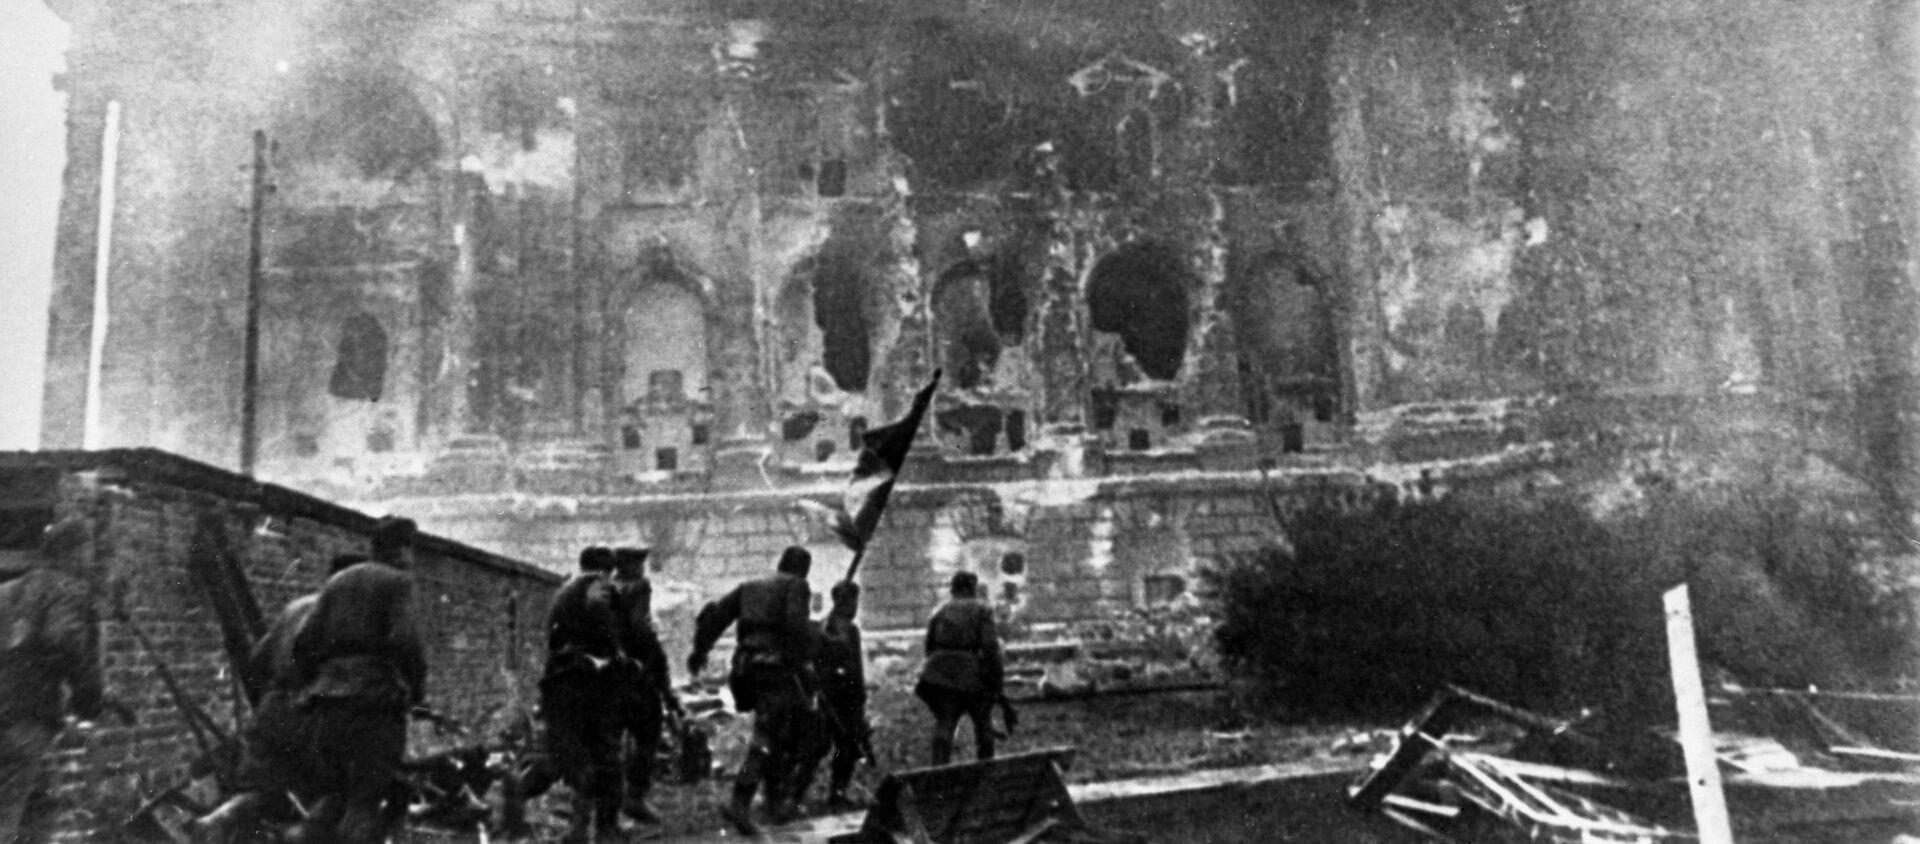 Штурм Рейхстага, 1945 год - Sputnik Արմենիա, 1920, 22.06.2021